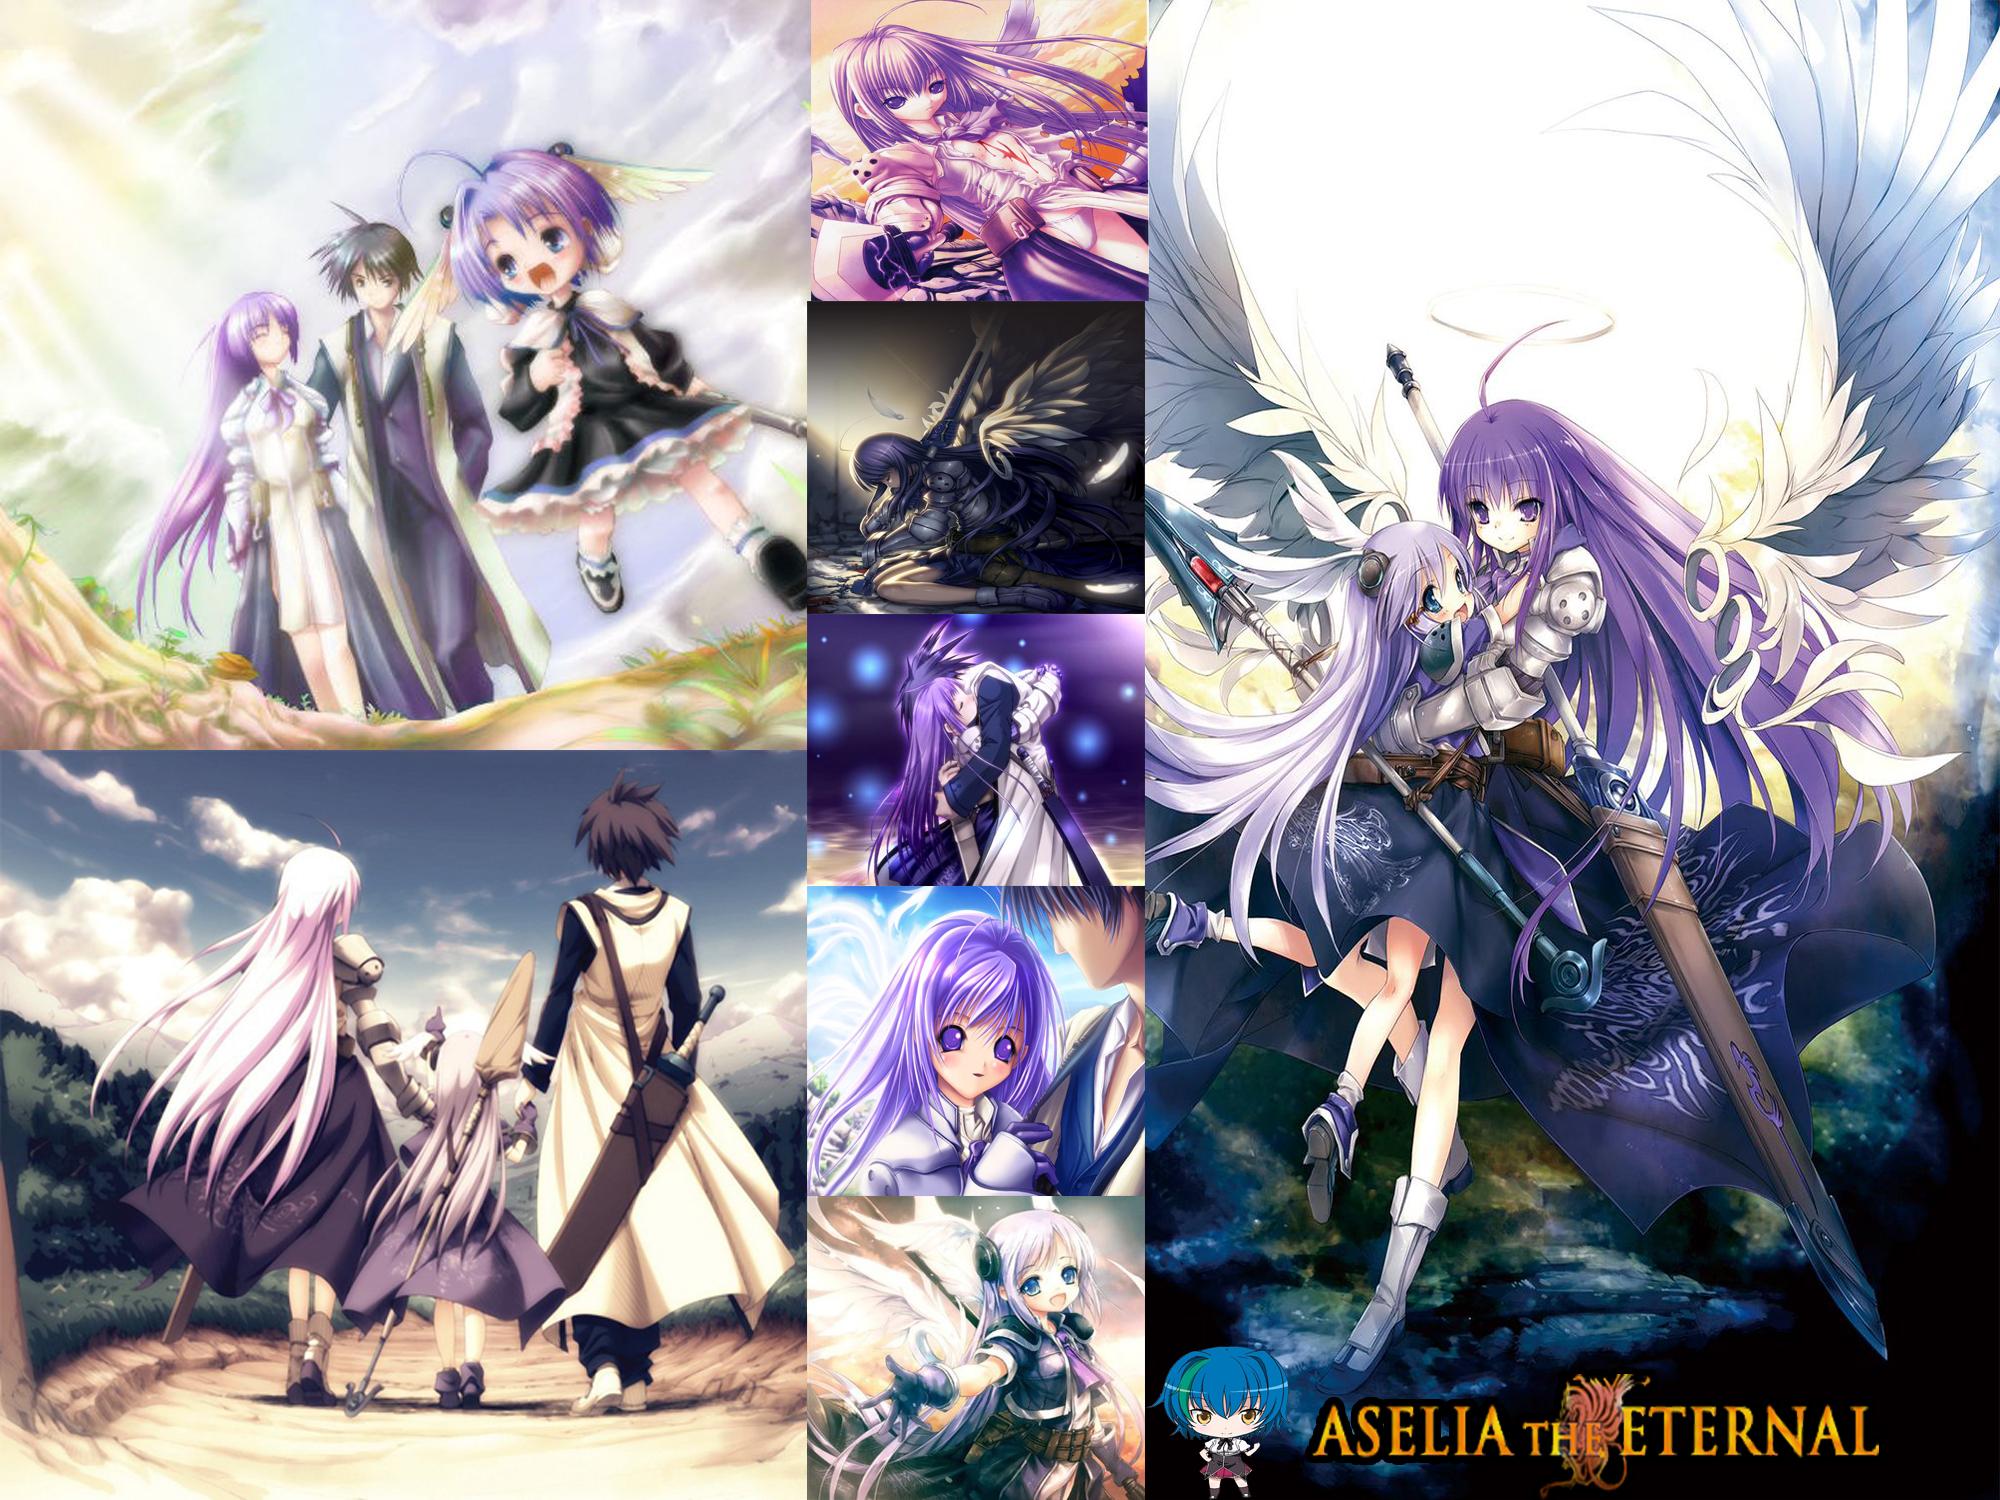 aselia the eternal